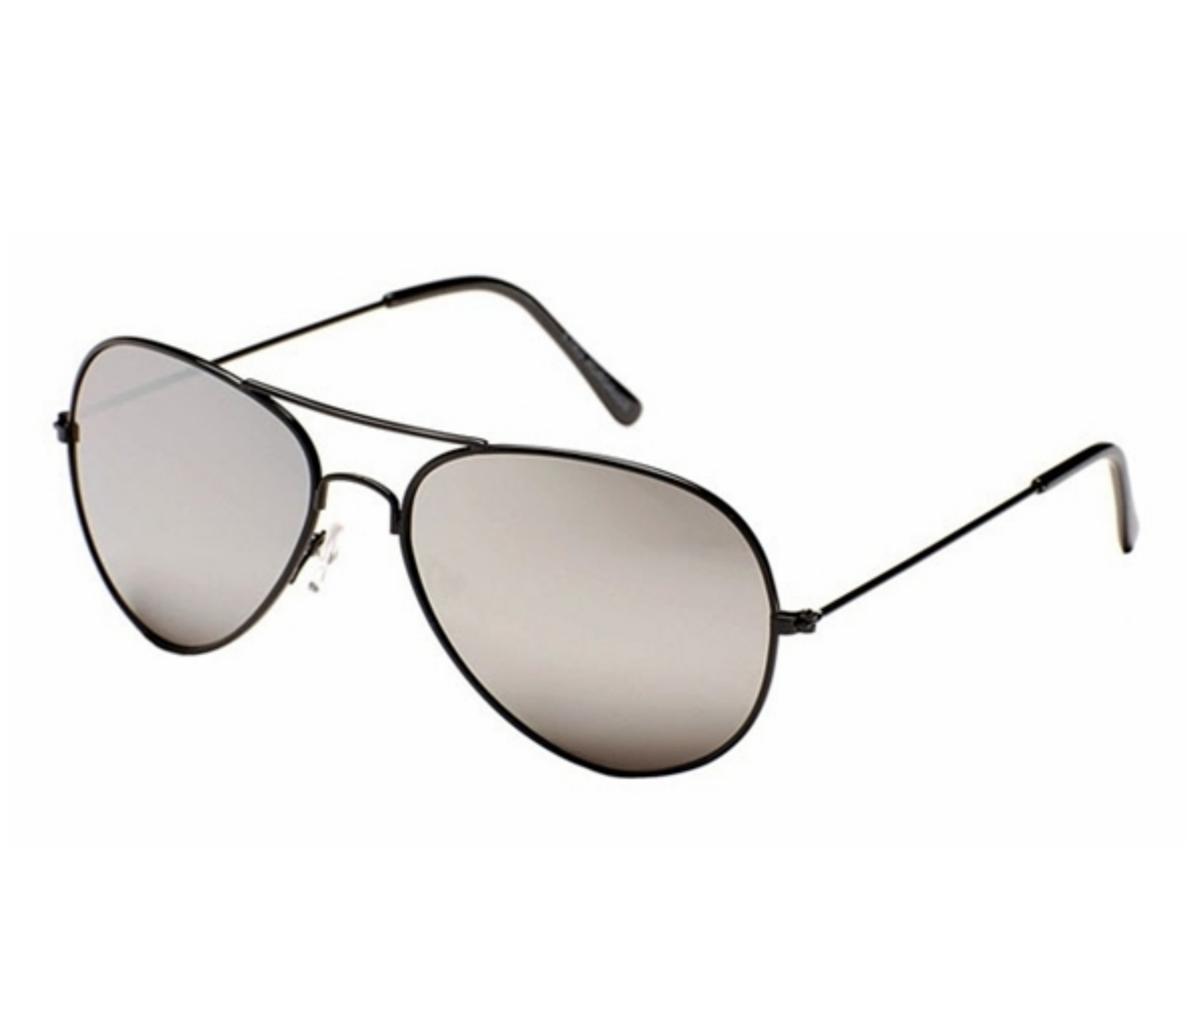 637869a5c4a7 Ebay Black Aviator Sunglasses